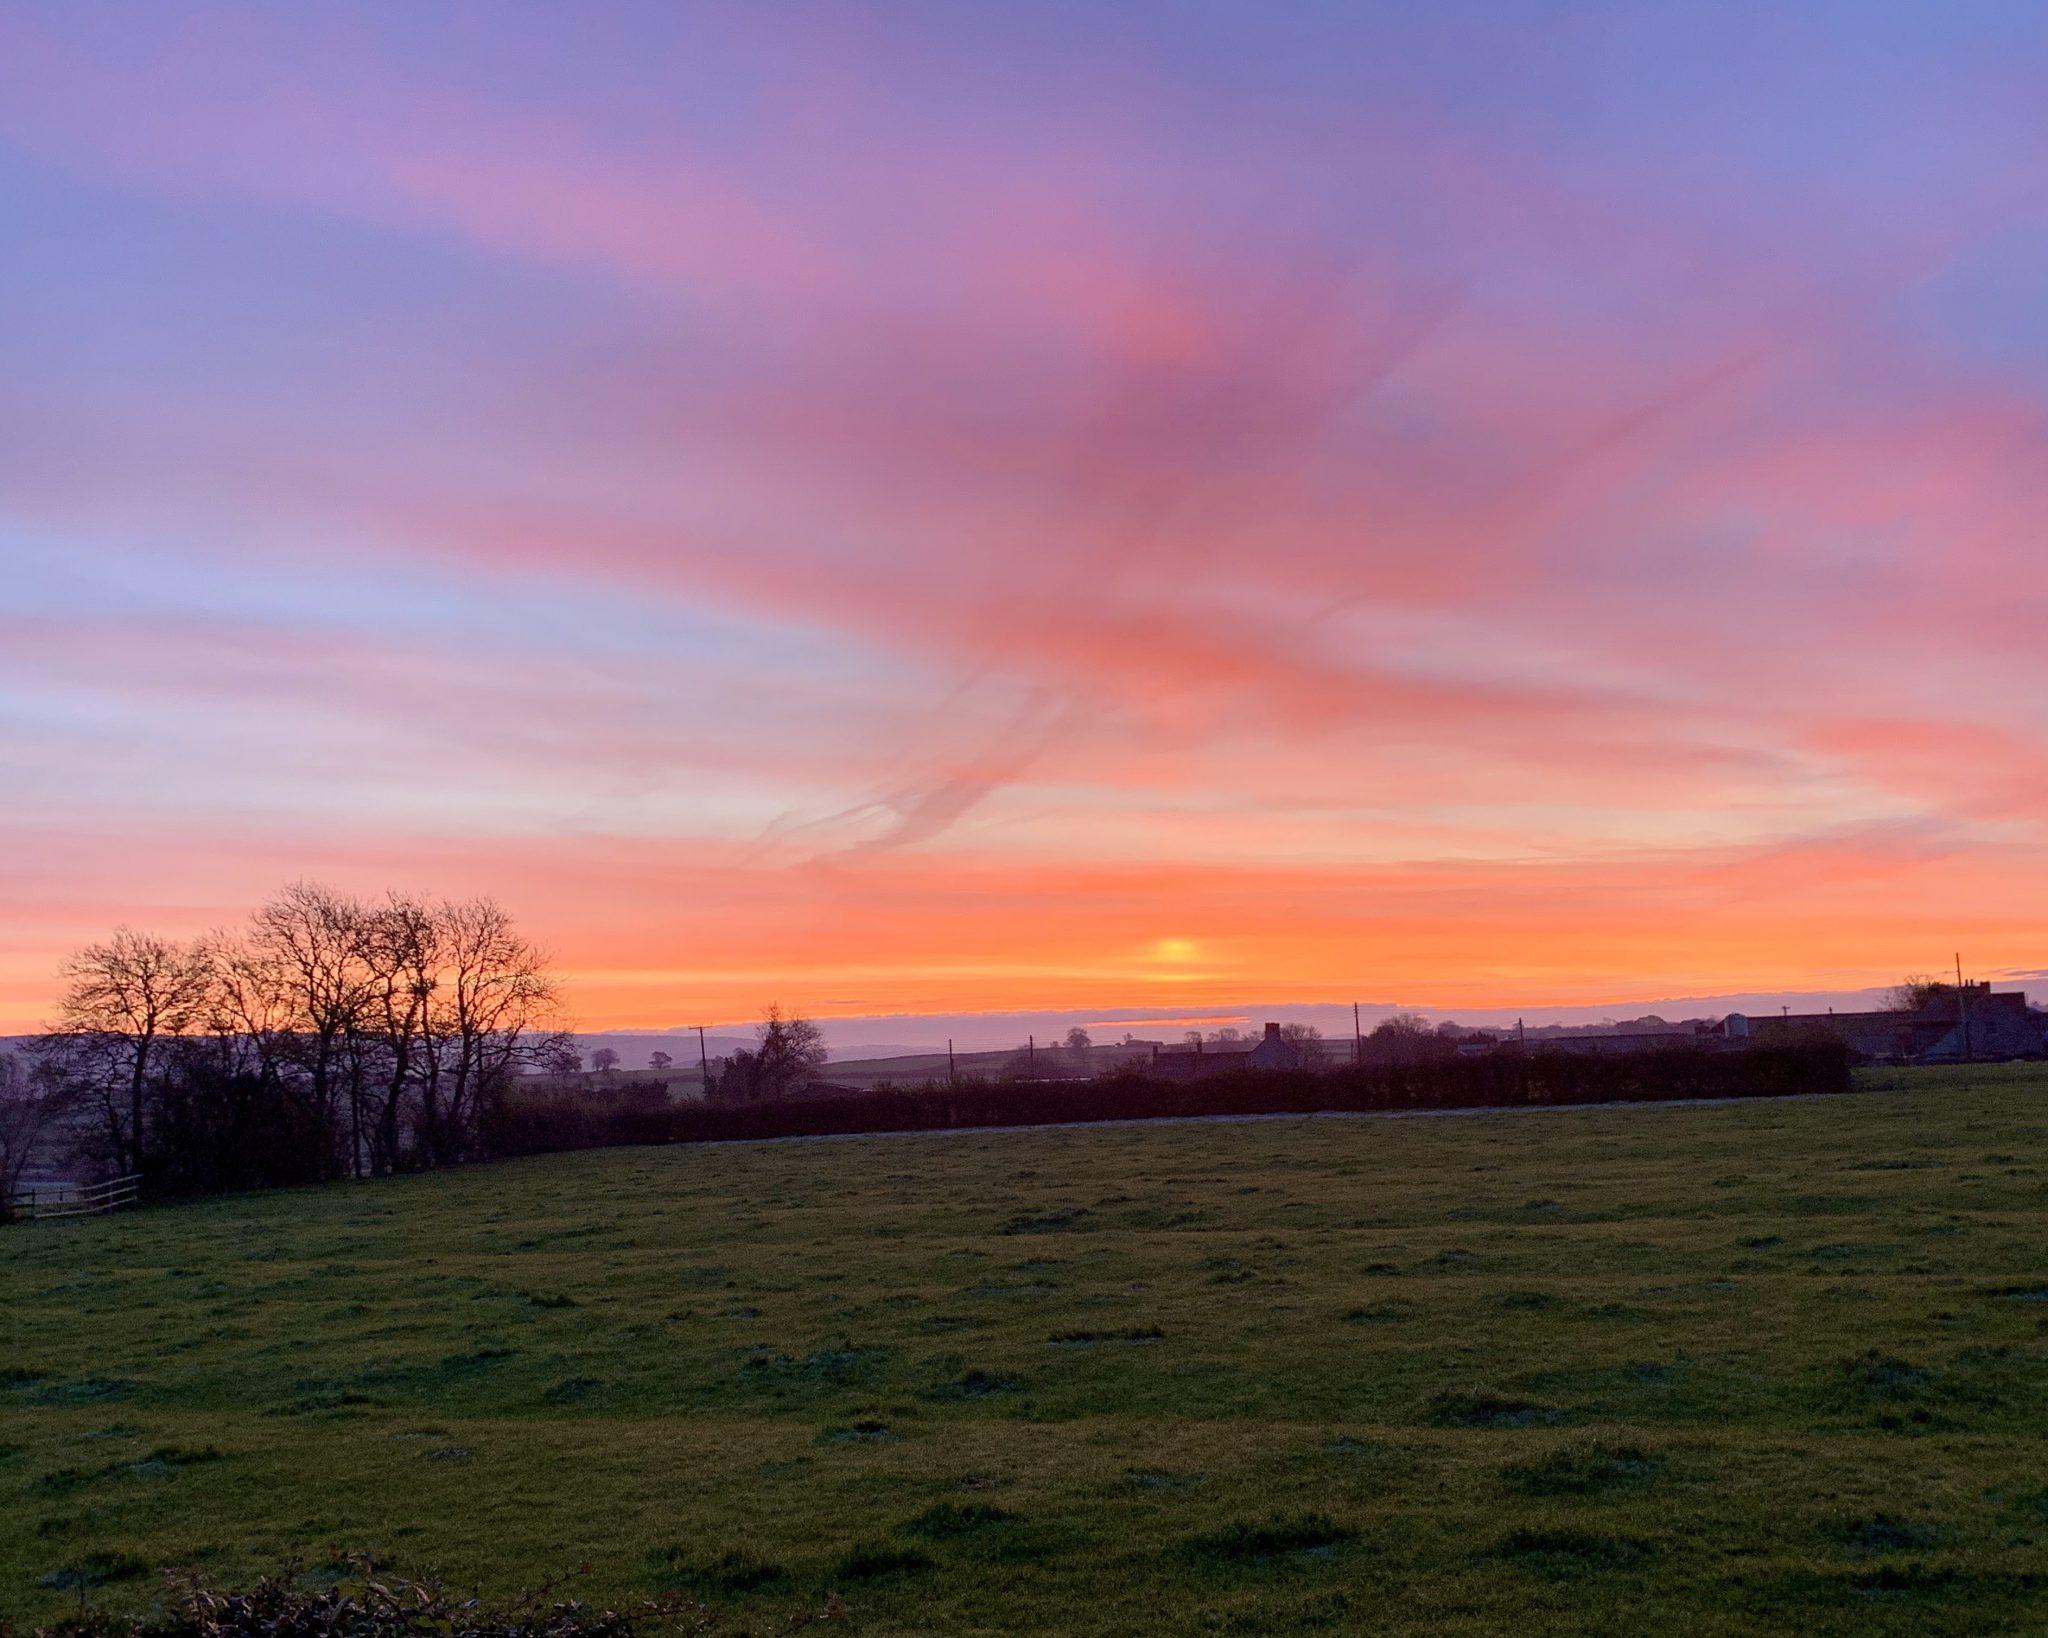 Sunrise 7.17am